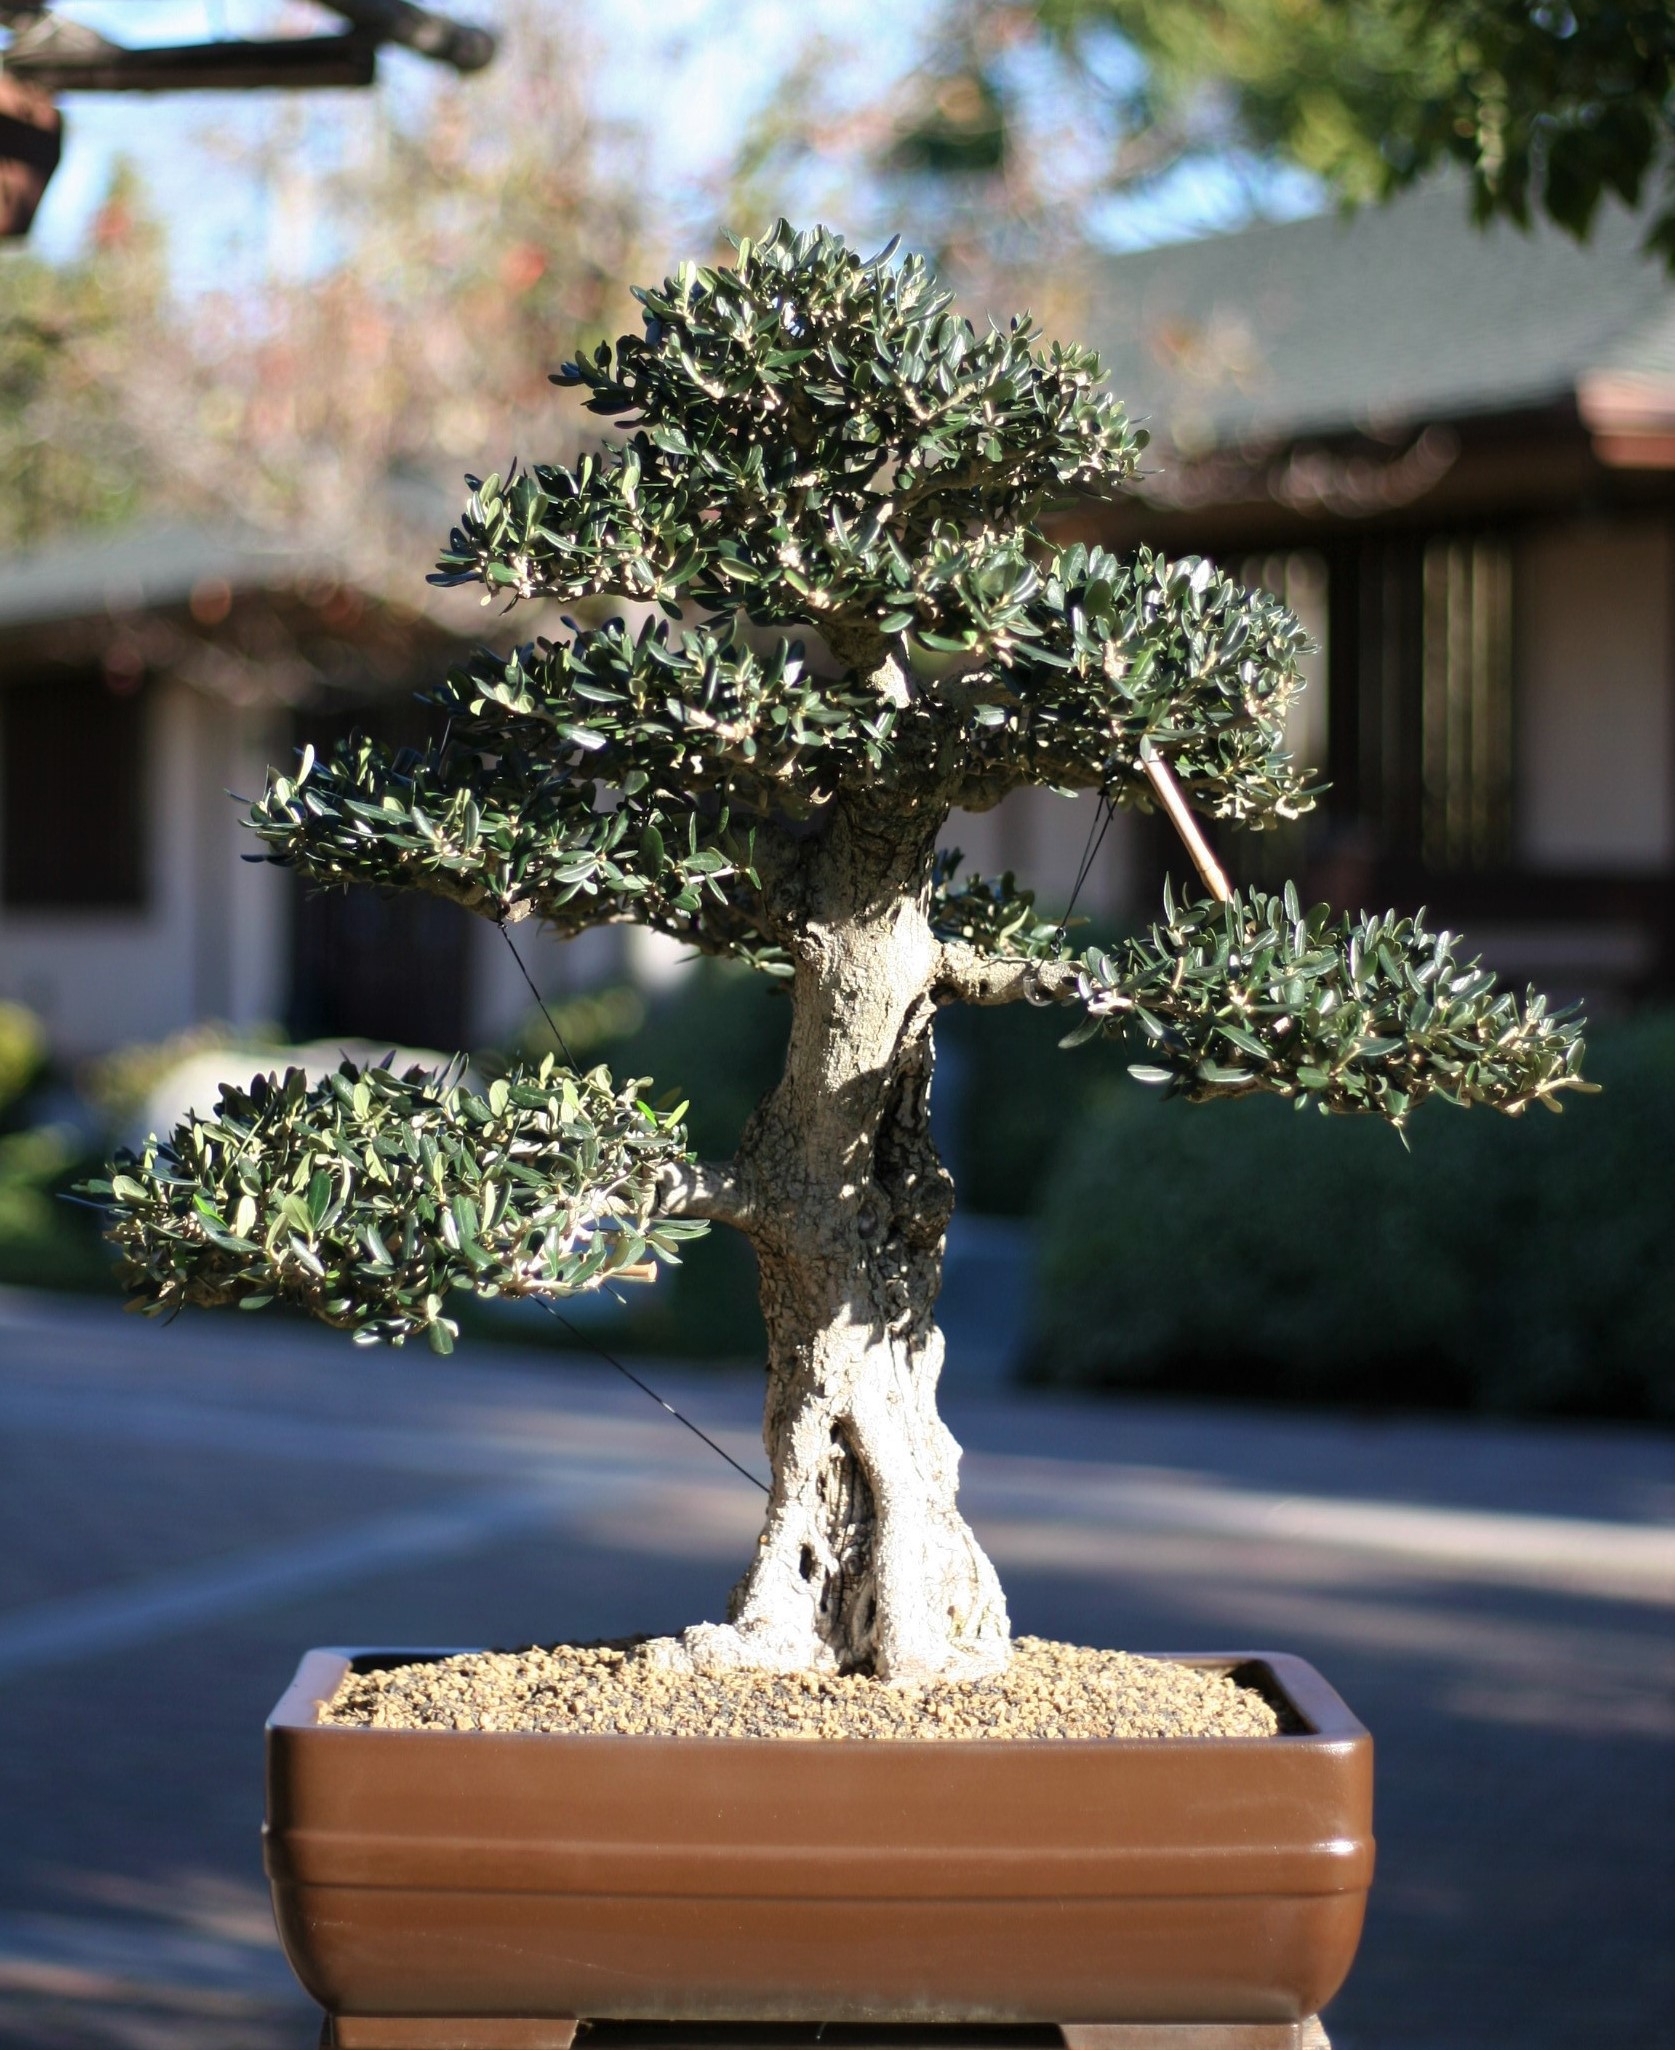 13. European Olive